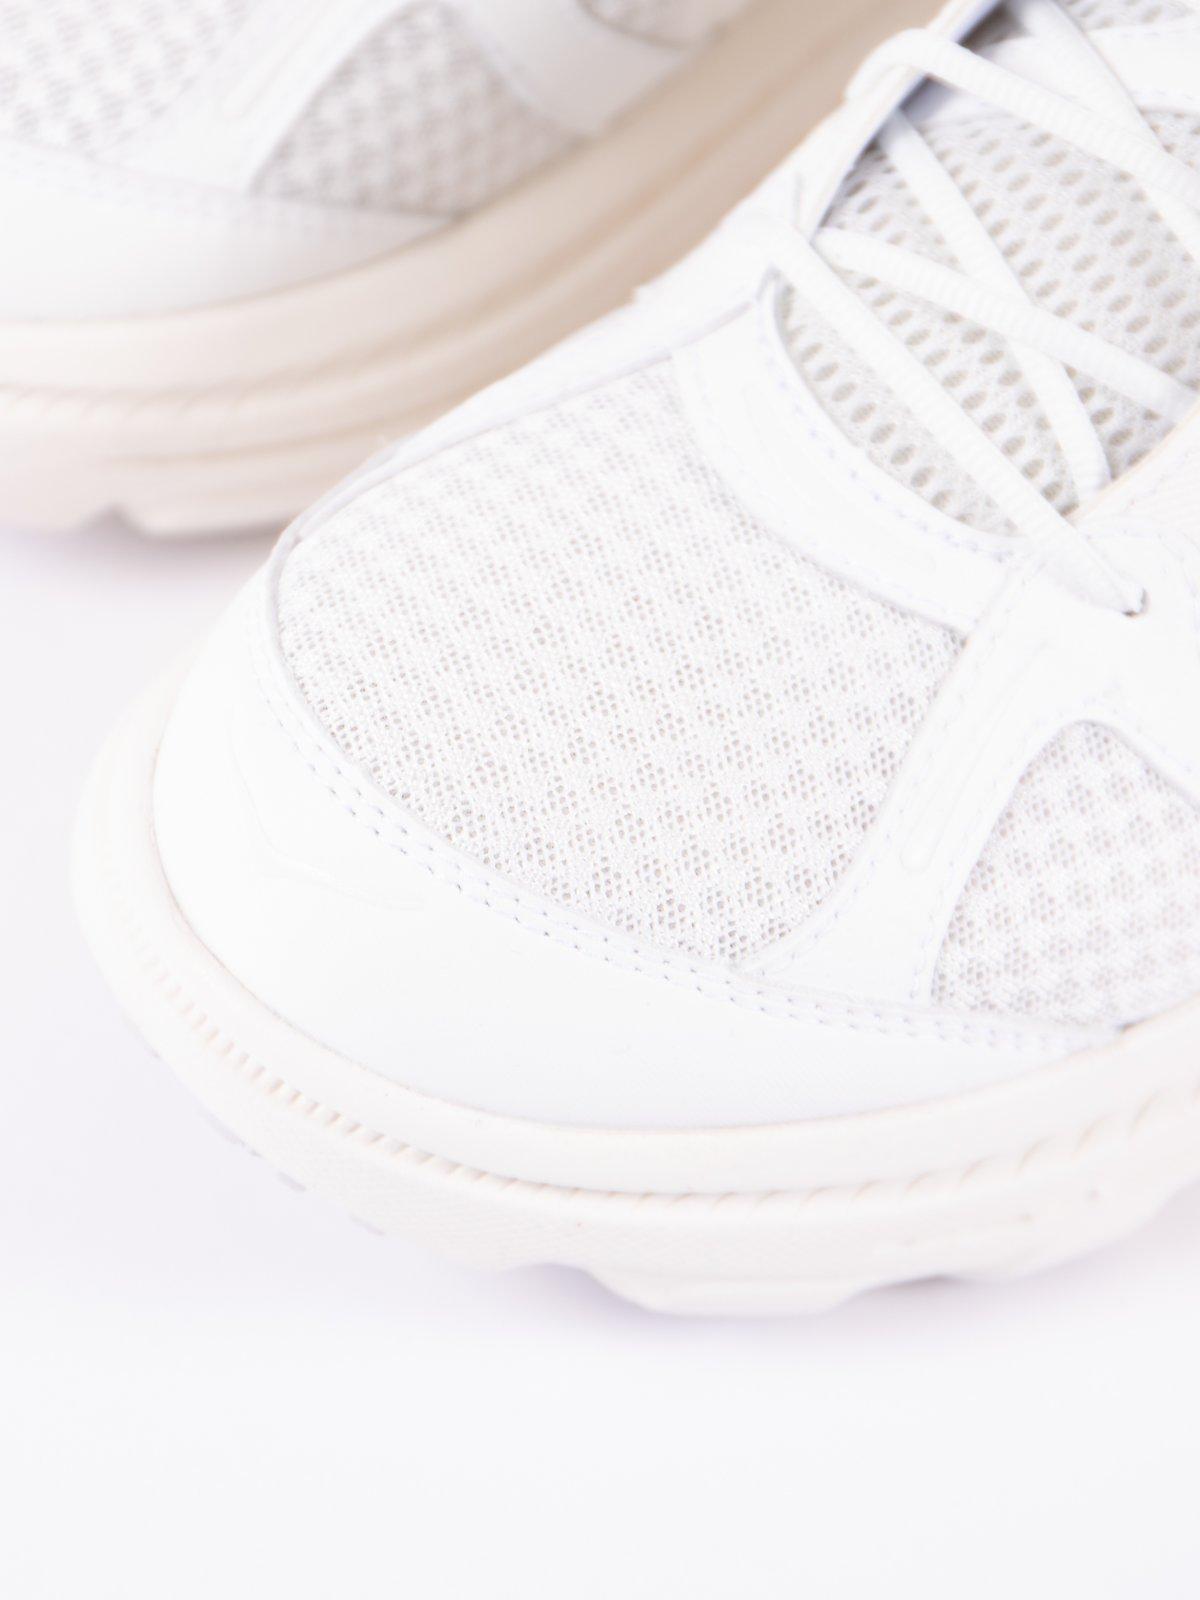 Hoka x EG White Bondi B - Image 3